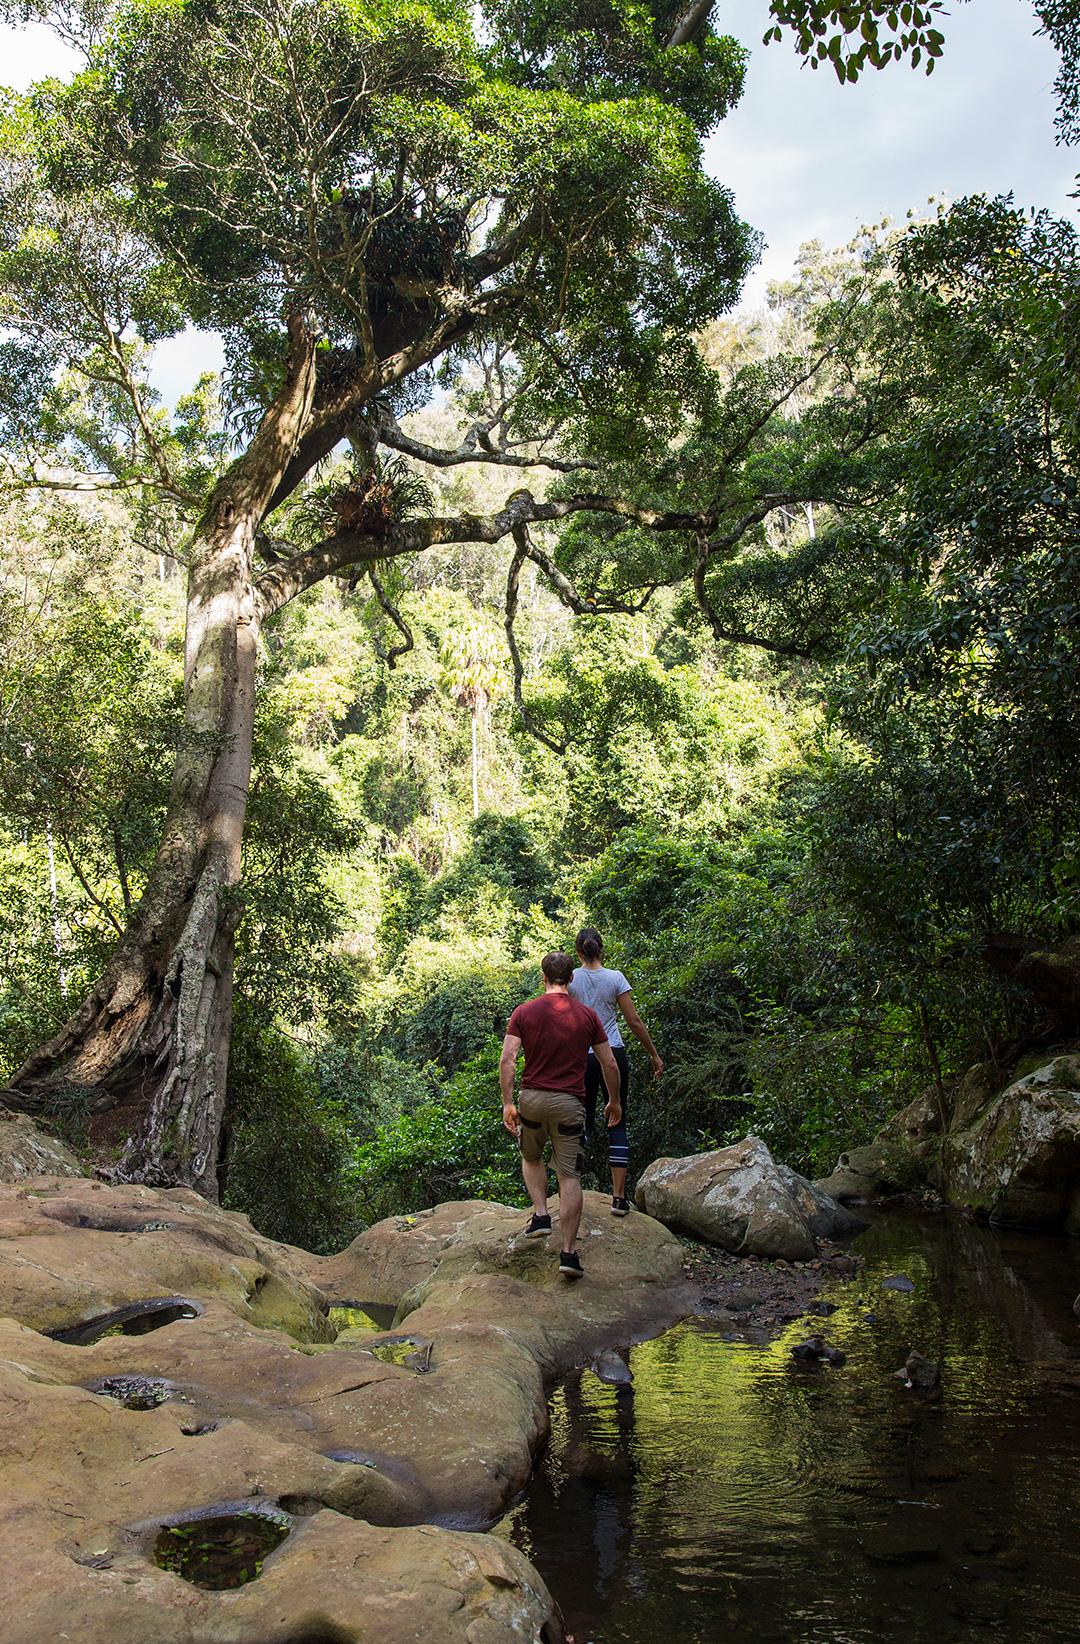 two people on walking track in bush